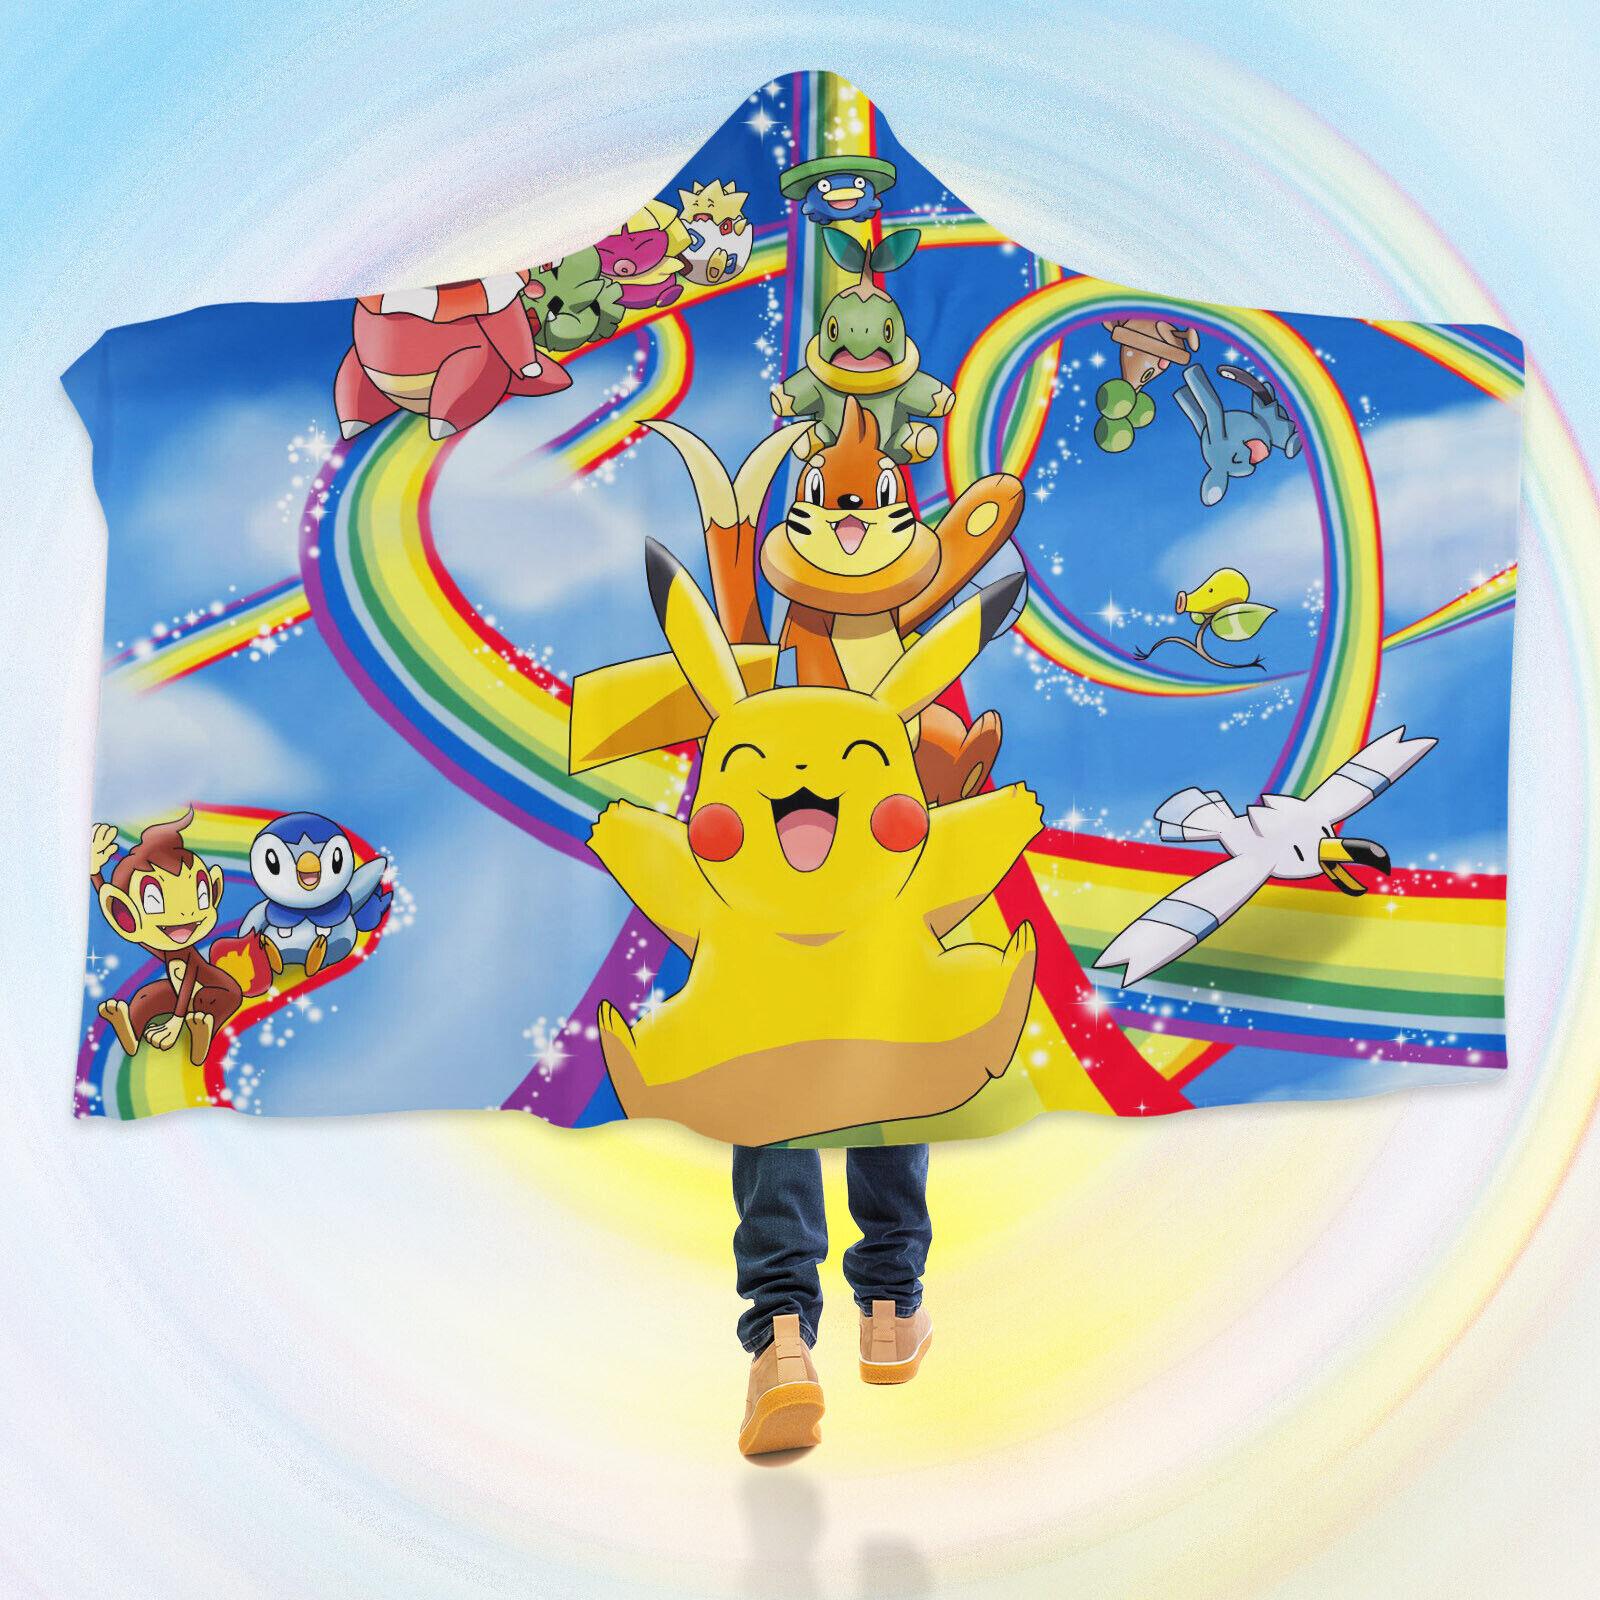 3D Hooded Blanket For Pokemon A29 Hooded Blanket Cloak Japan Anime Cosplay Zoe